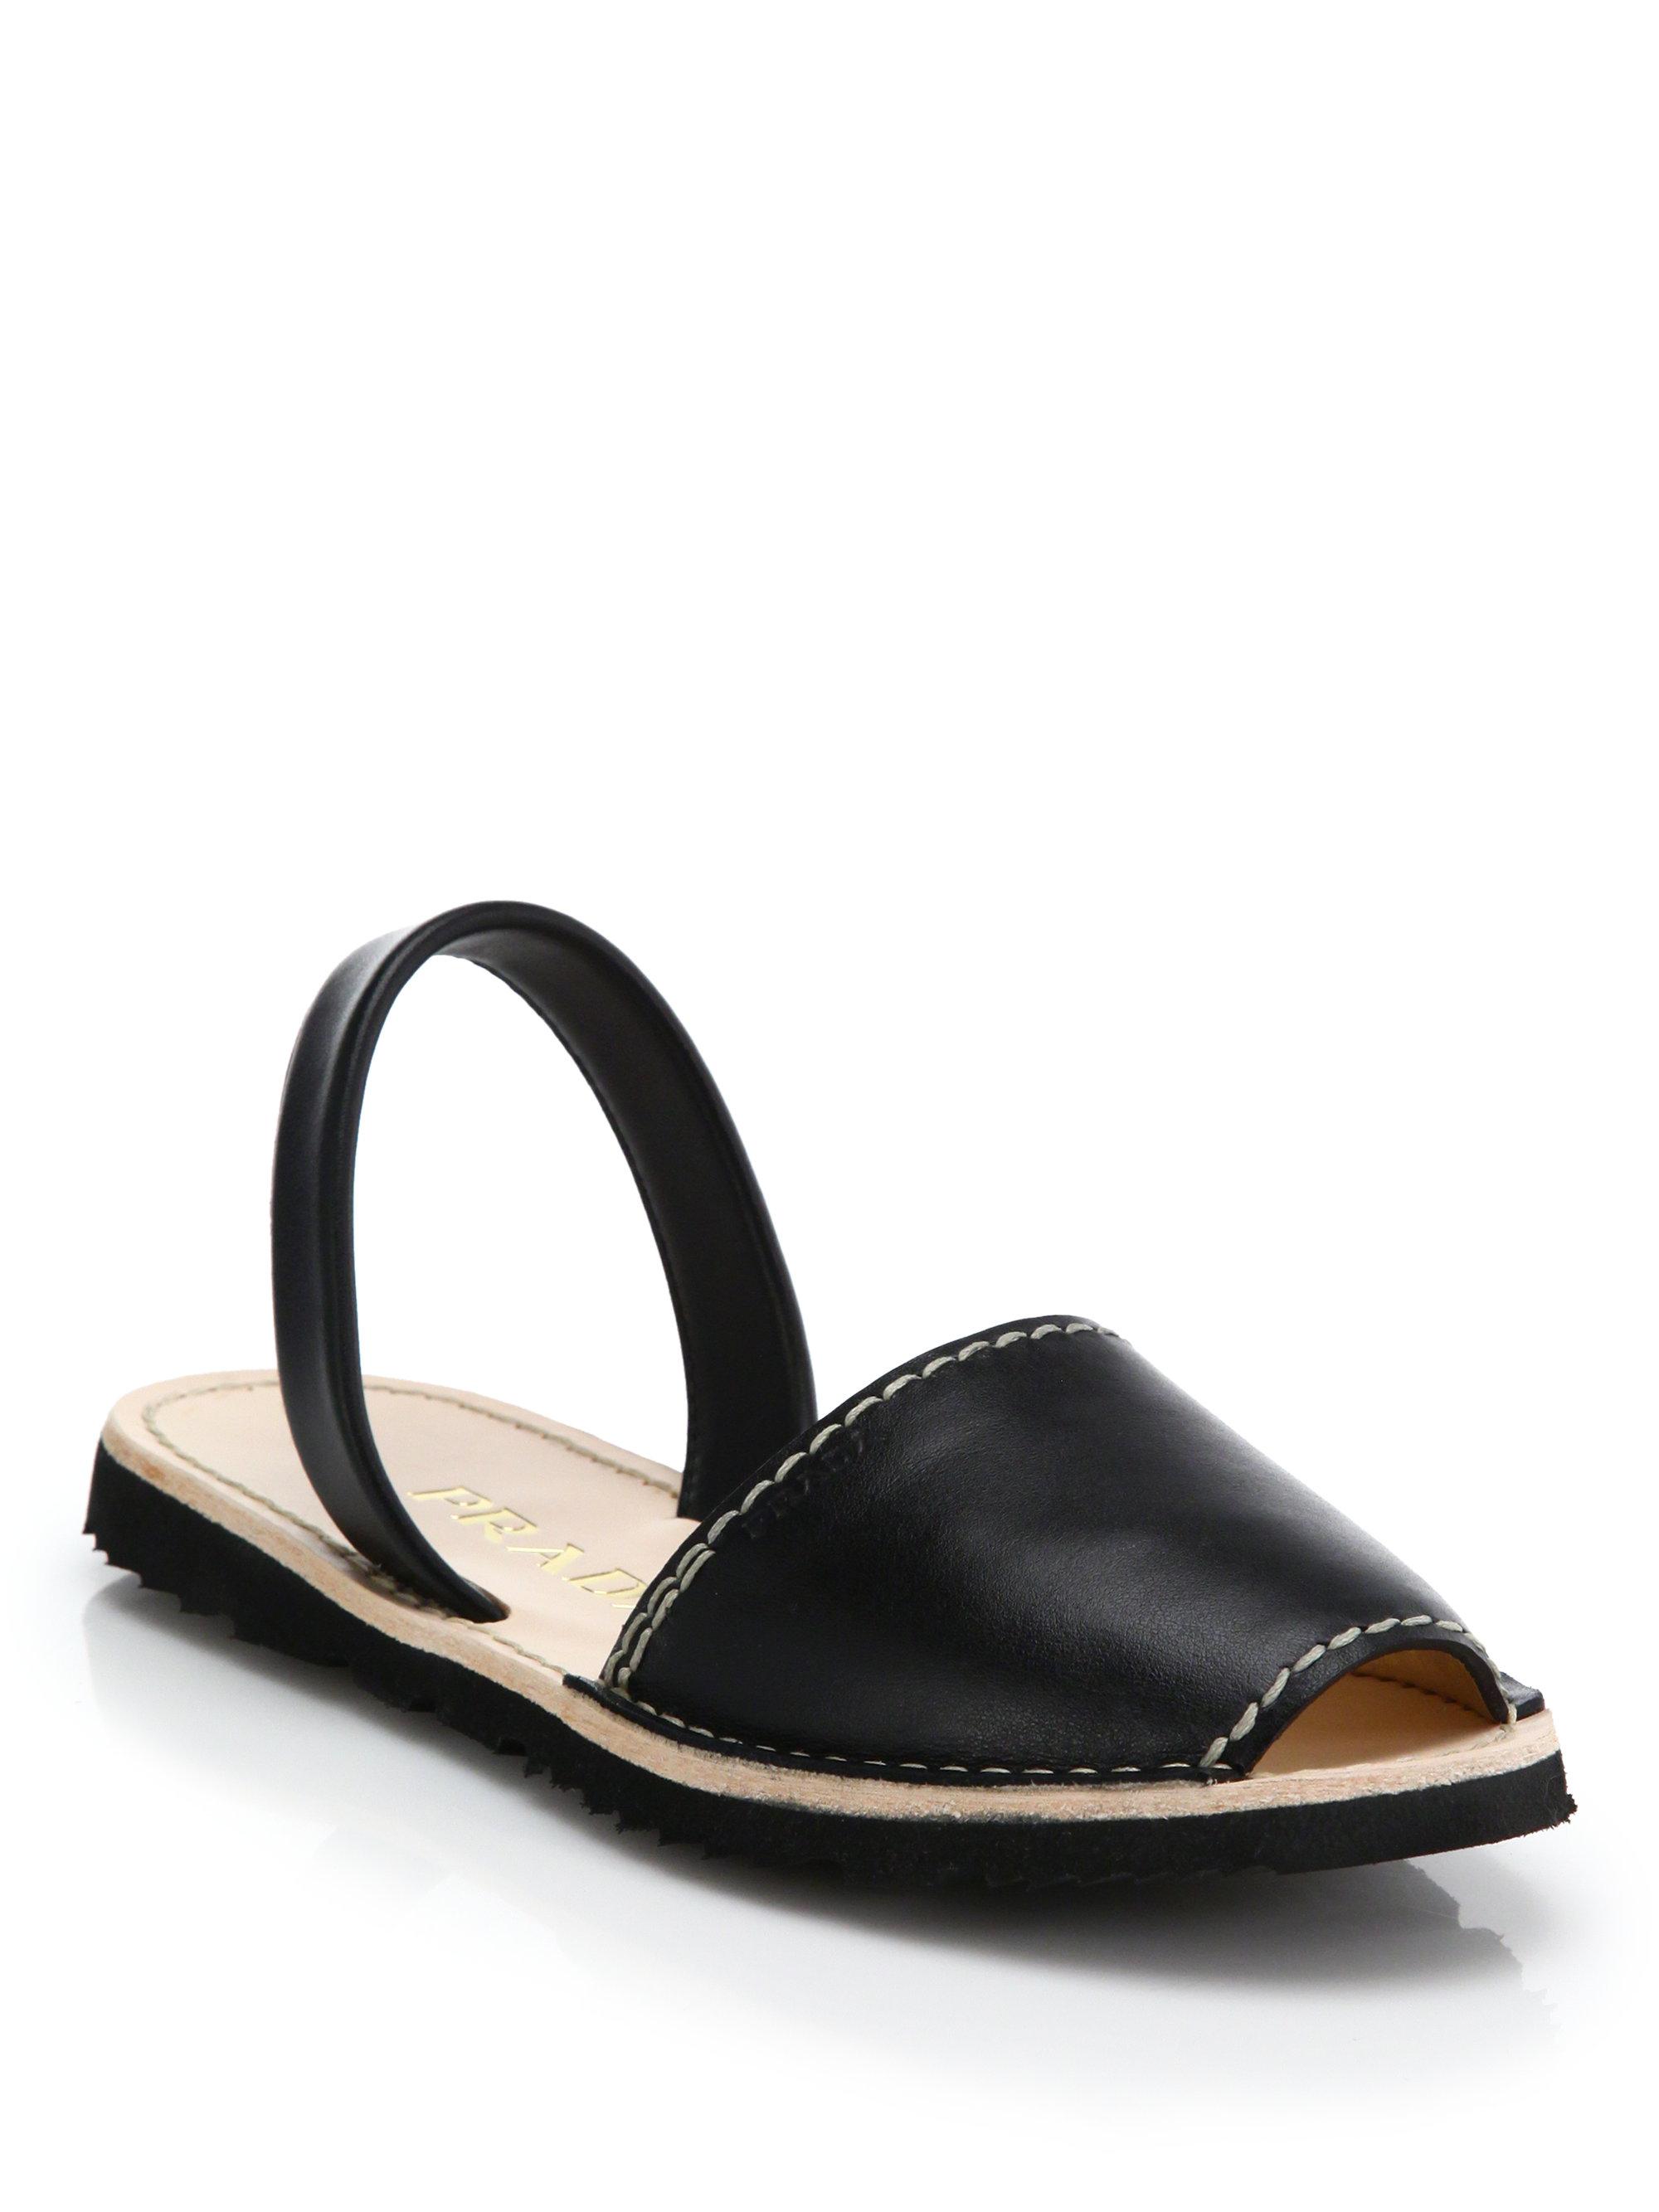 Prada Flat Leather Slingback Sandals in